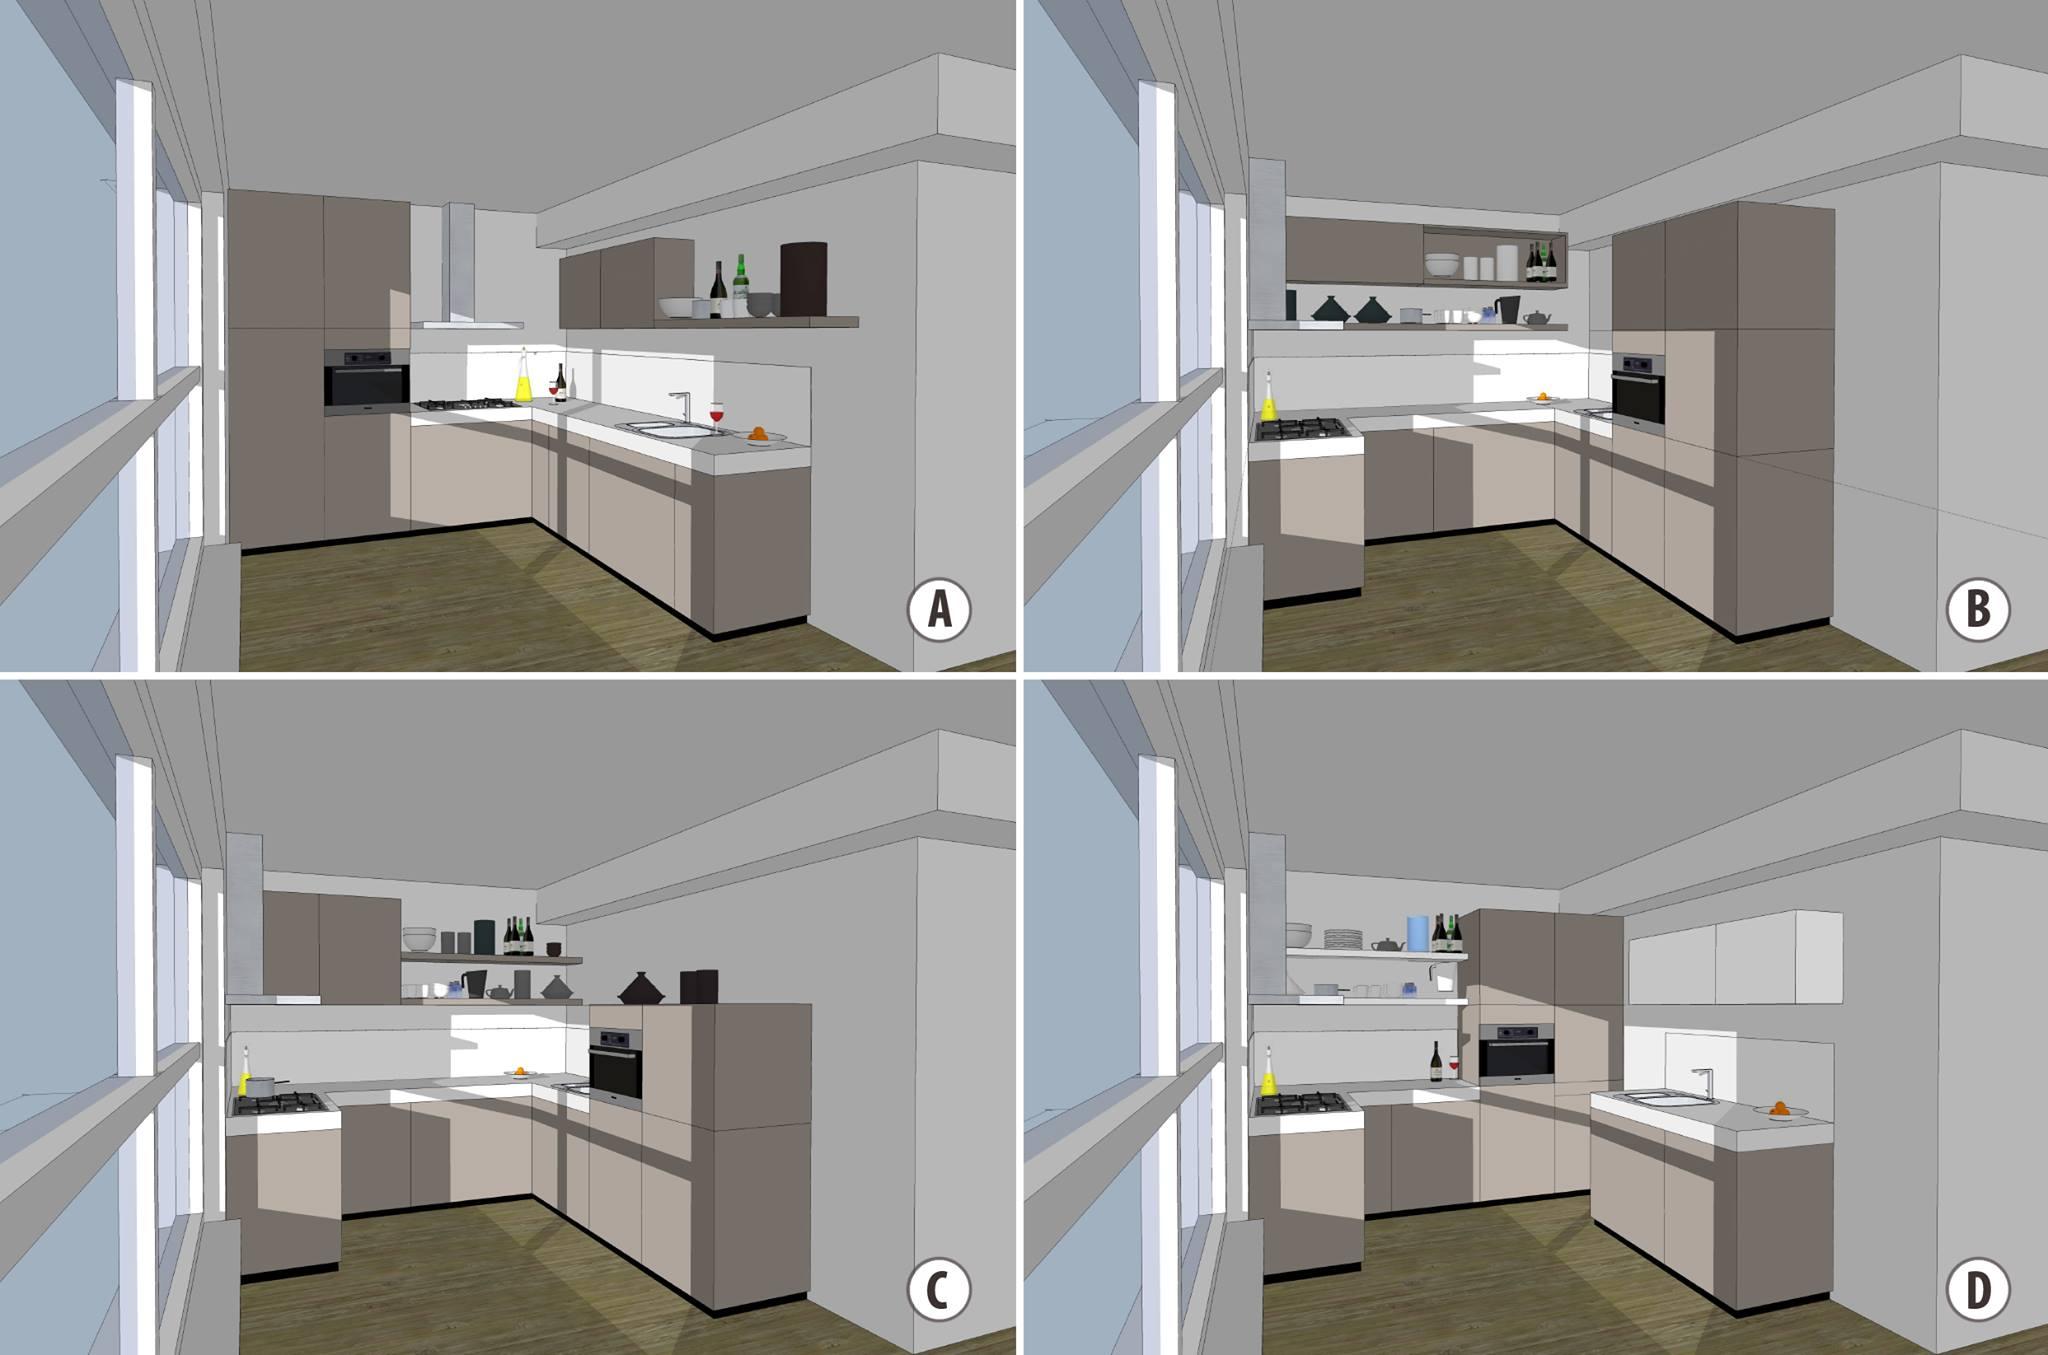 Keukeneiland T Vorm : Goedkope keukens u vorm keukenmontage montage keukens jan van